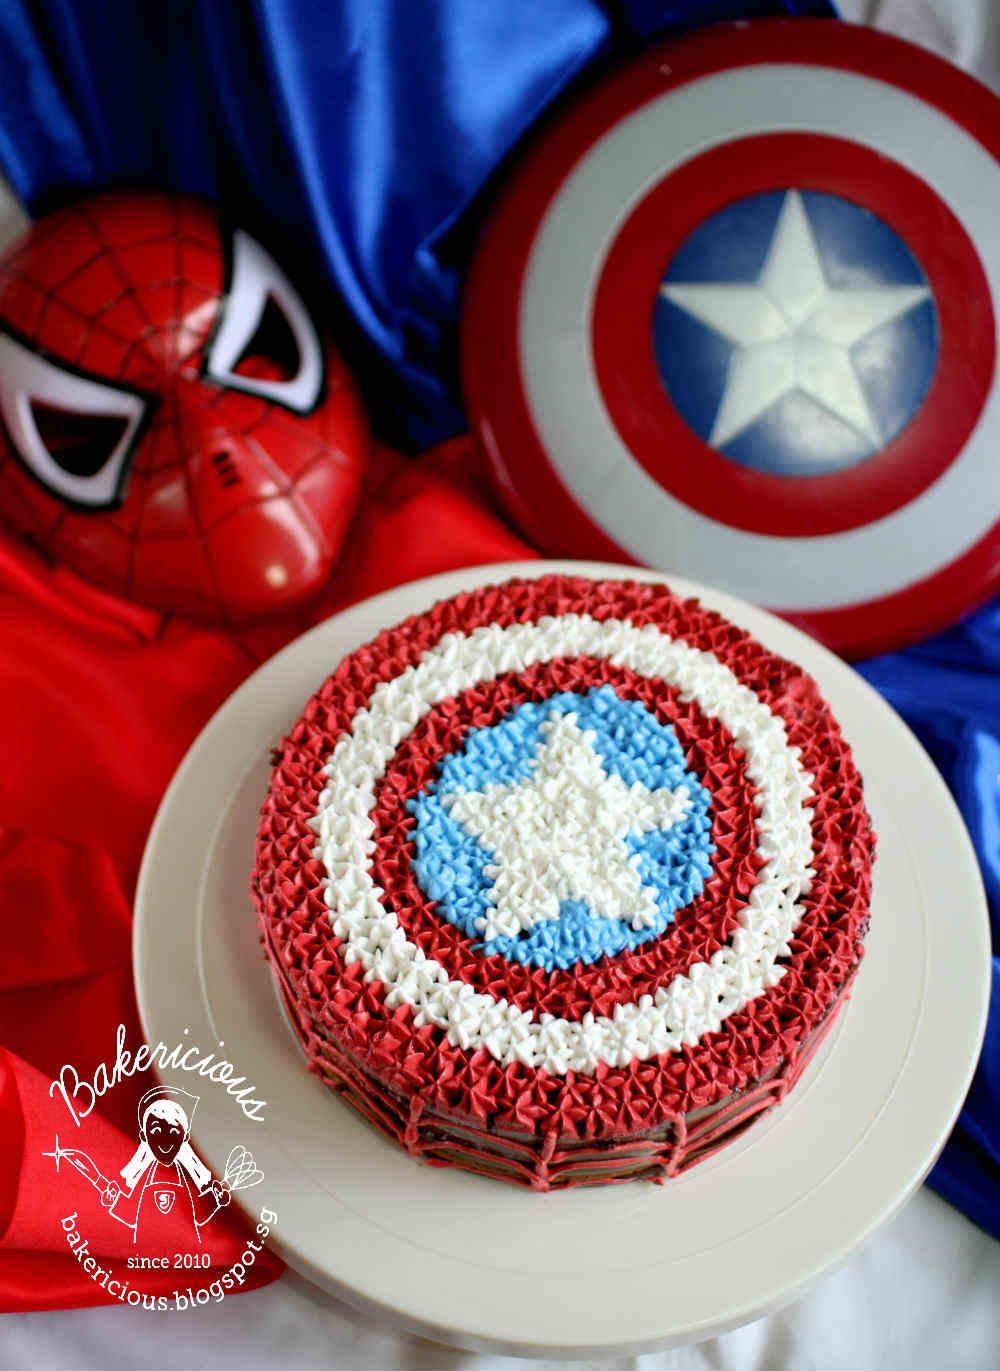 Bakericious Captain America And Spiderman Chocolate Fudge Cake